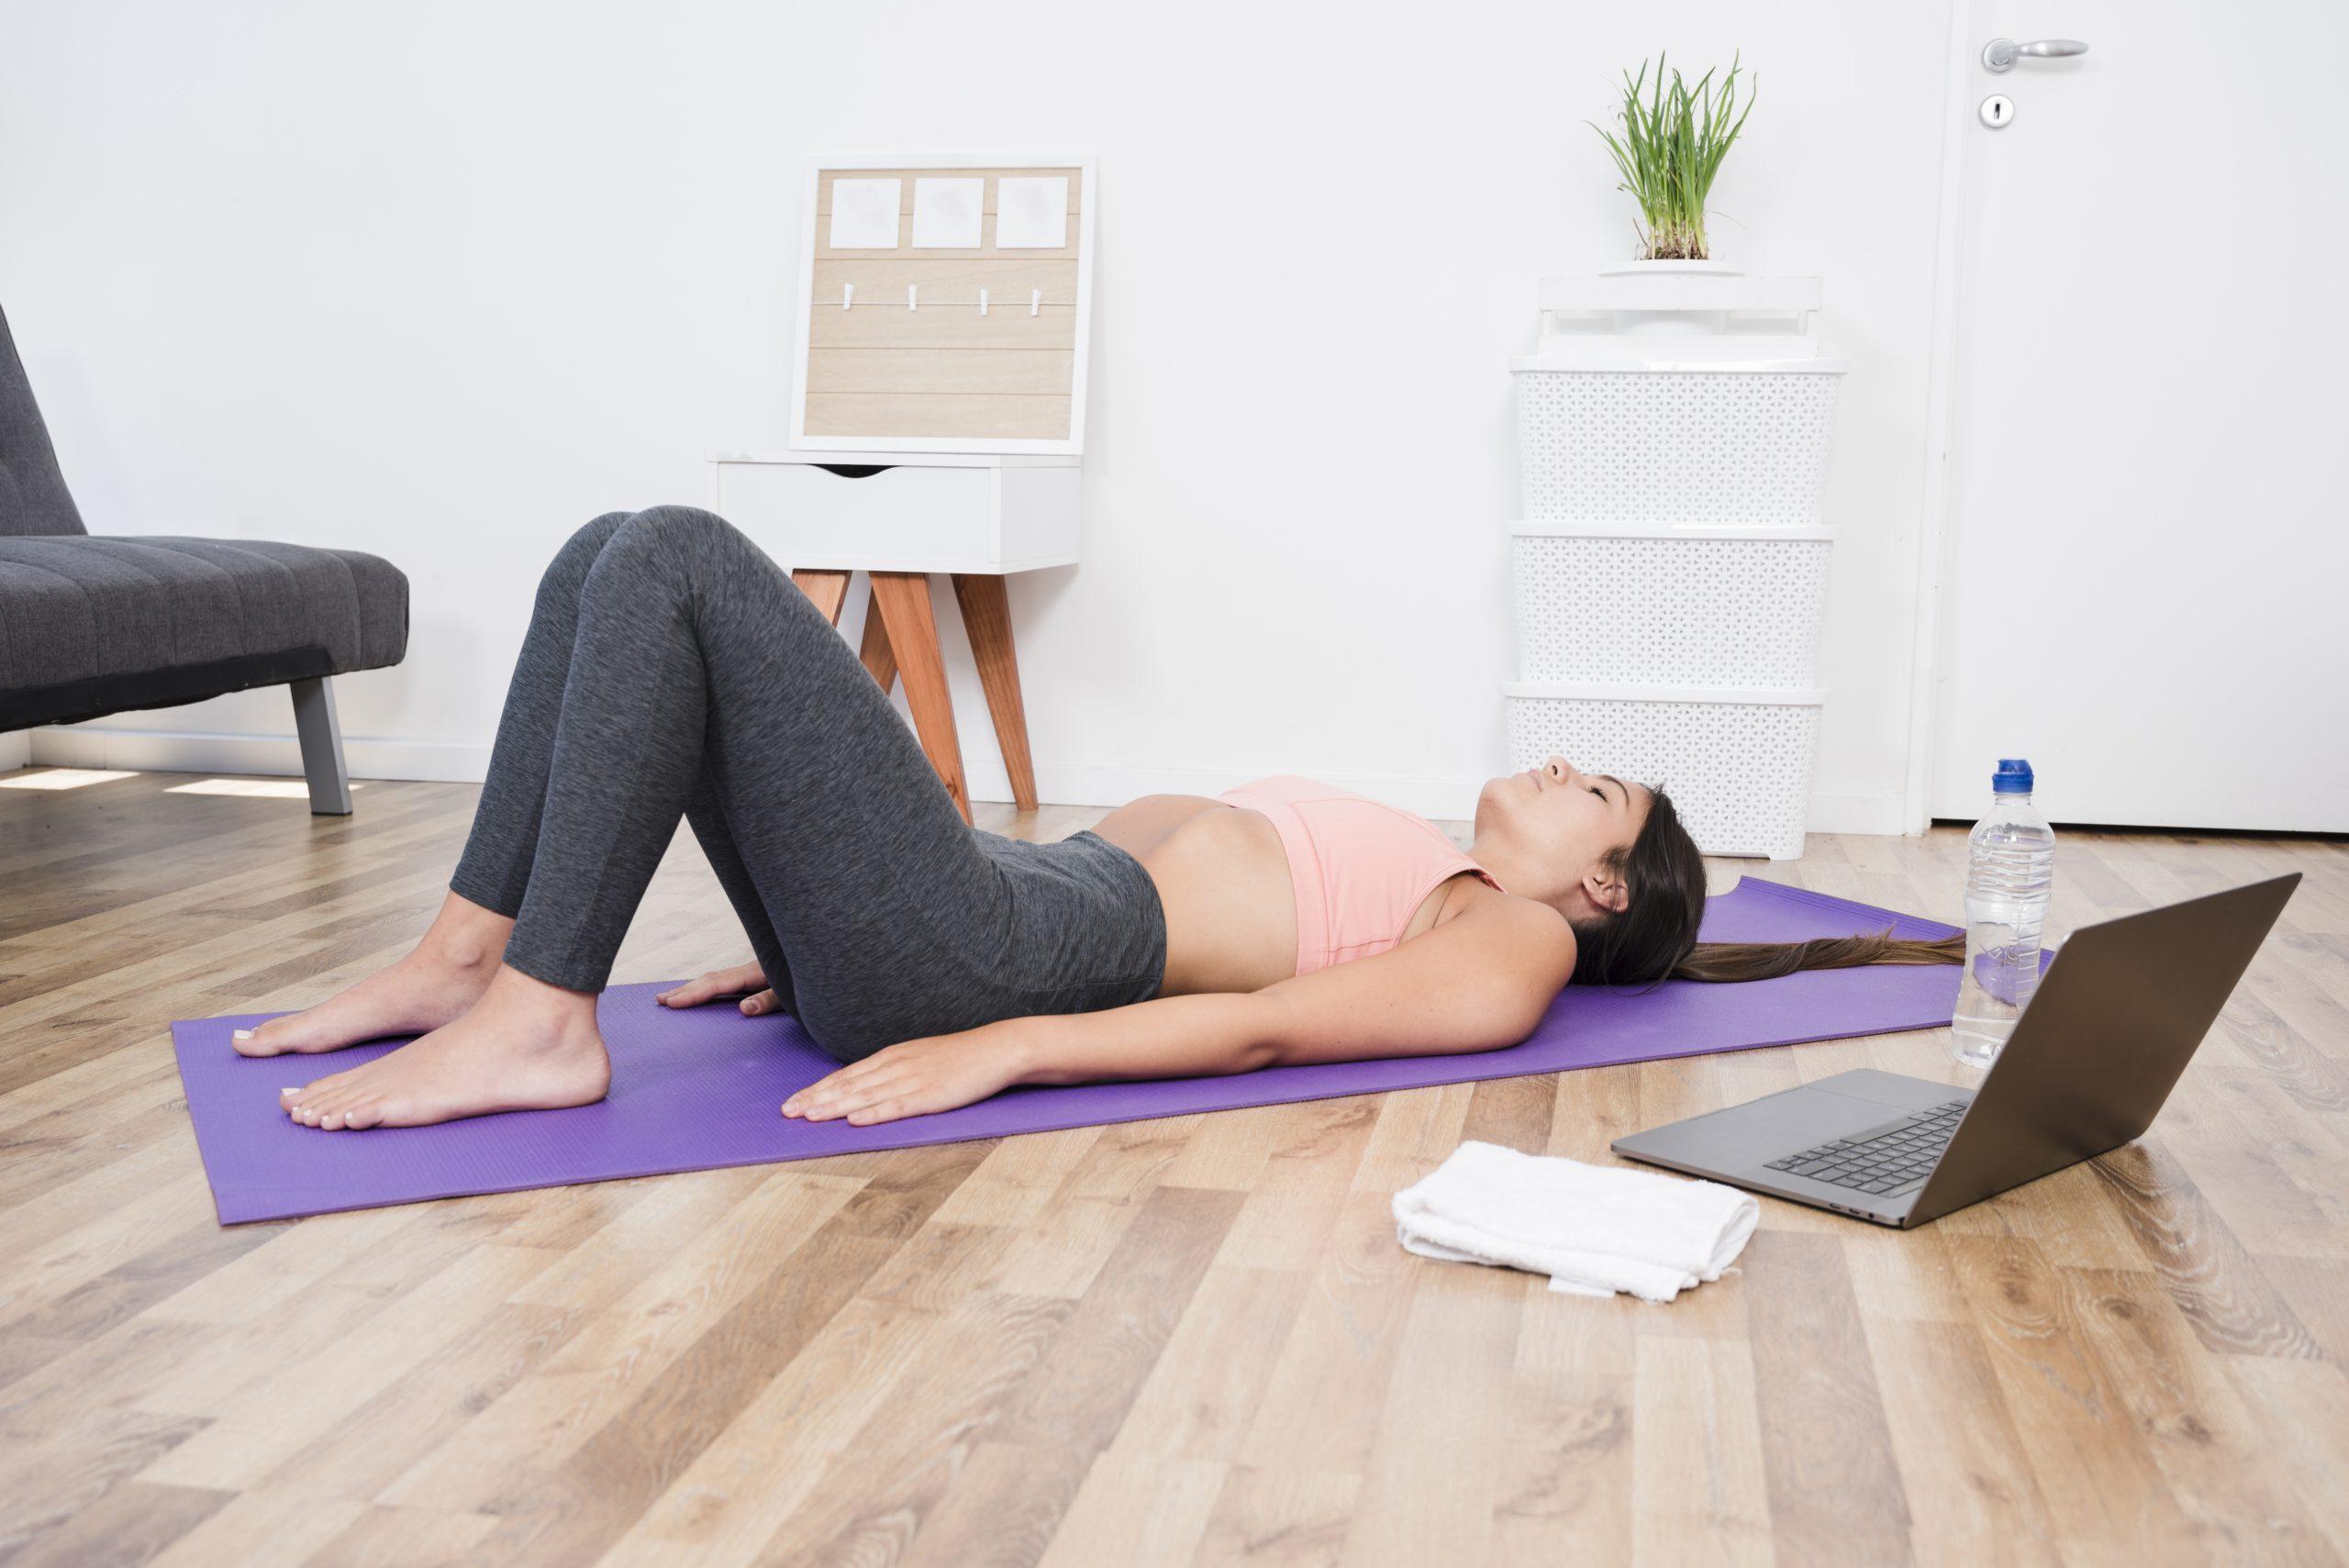 online yoga, yoga online, hatha yoga online, vinyasa yoga online, online coaching, group coaching online, group yoga classes, free yoga classes online, free yoga tutorials